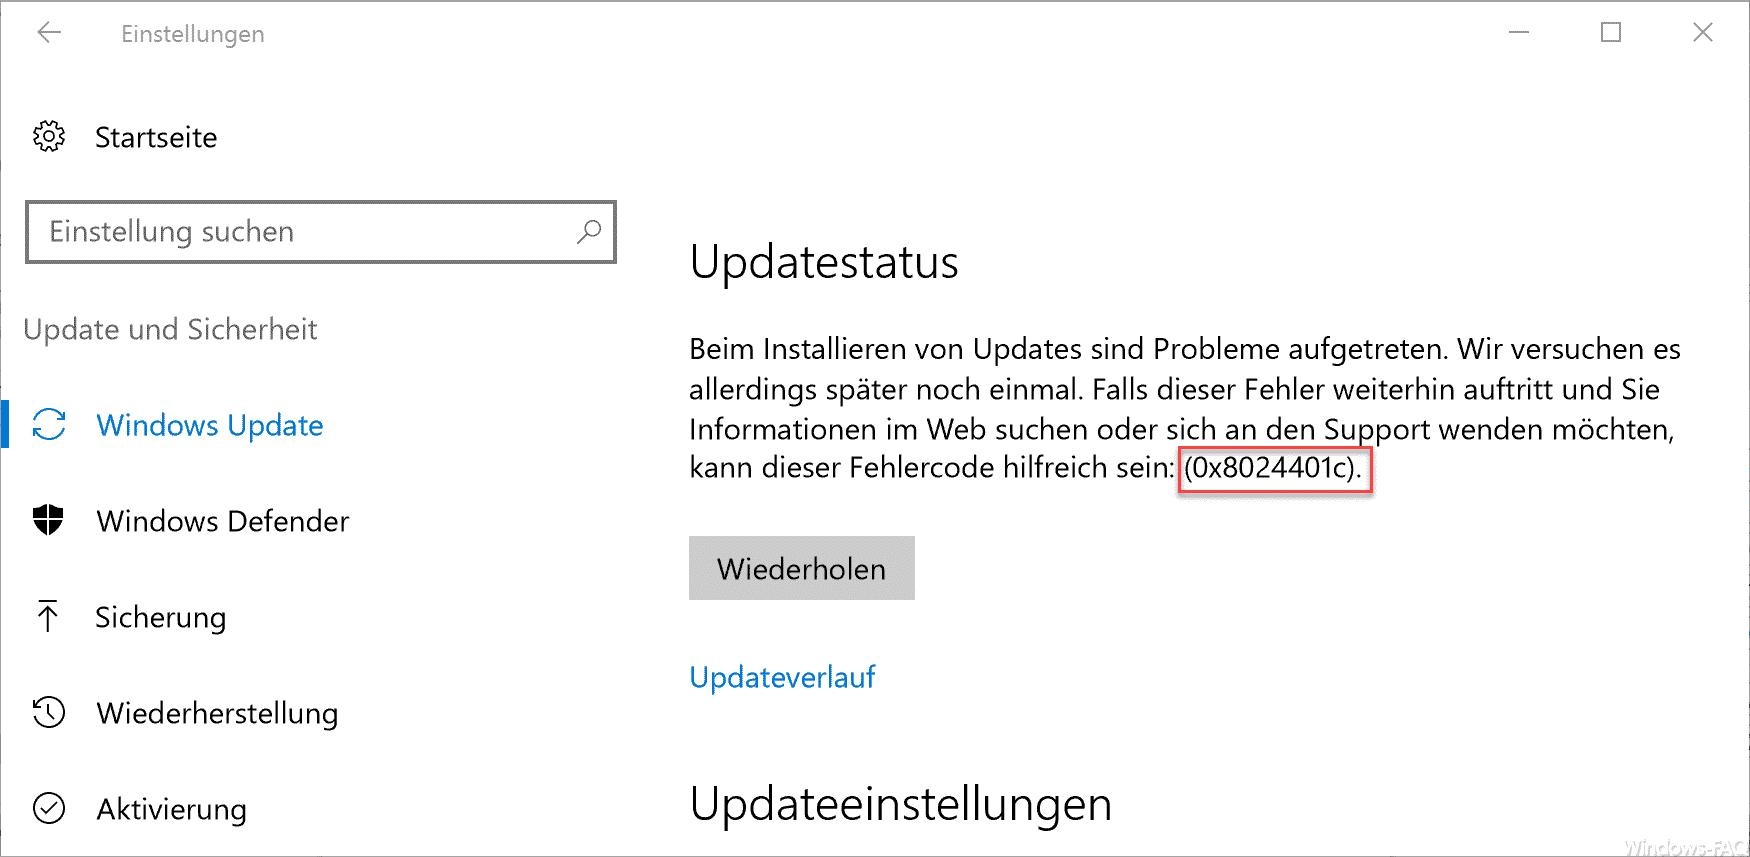 0x8024401c Update Fehlermeldung